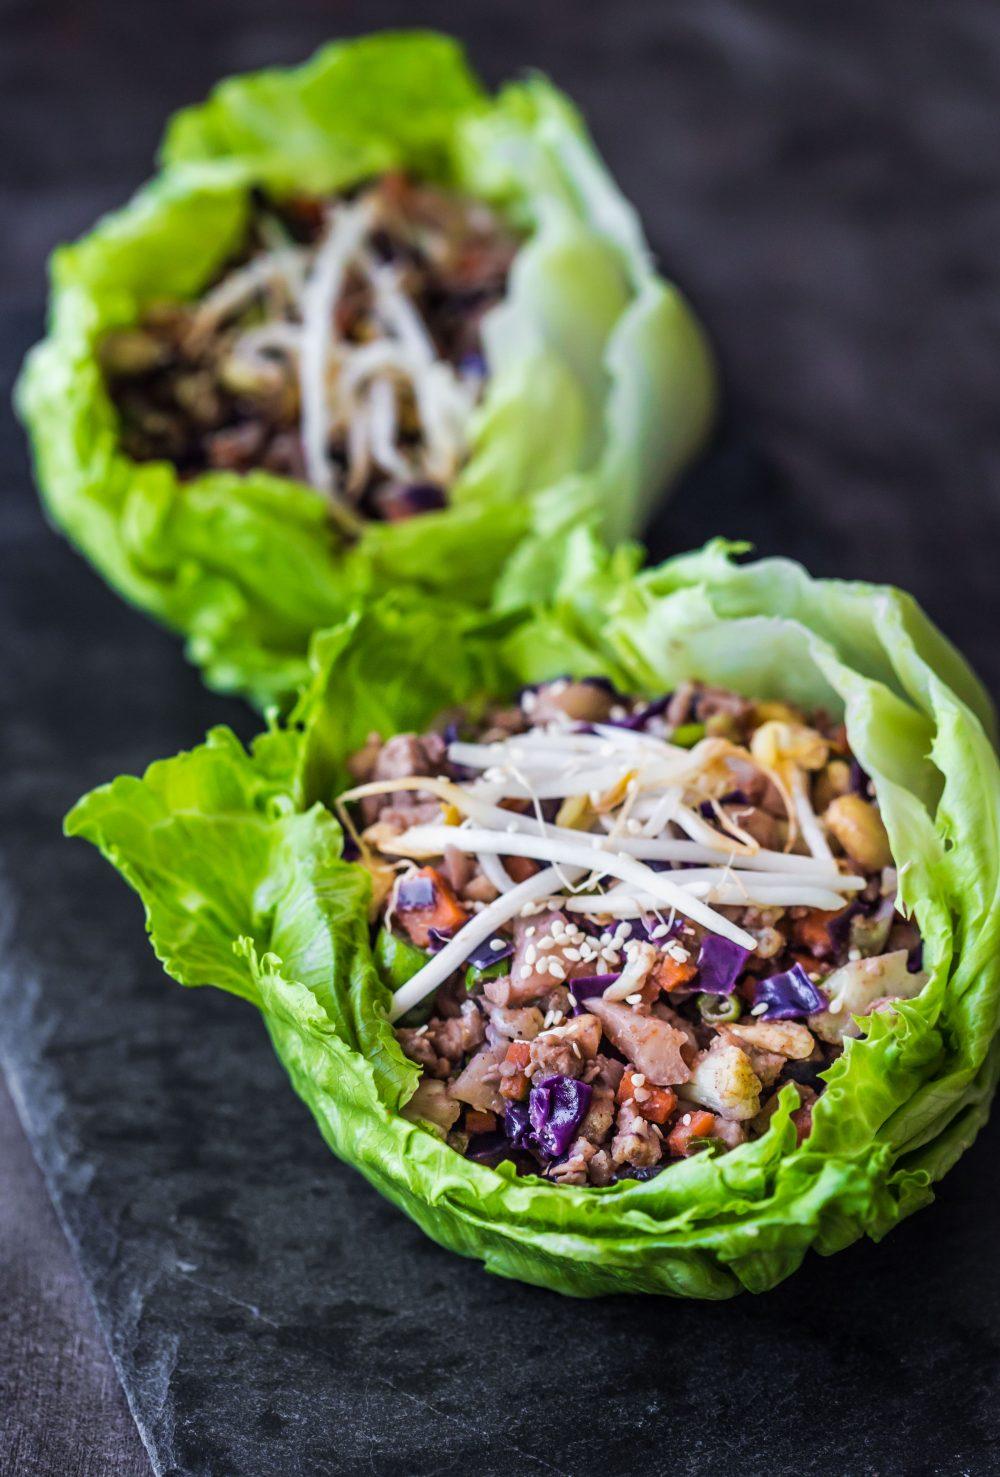 vegetable-lettuce-cups-vegan-san-choy-bow-vegetarian-gluten-free-entree-dinner-healthy-easy-under-30-minutes